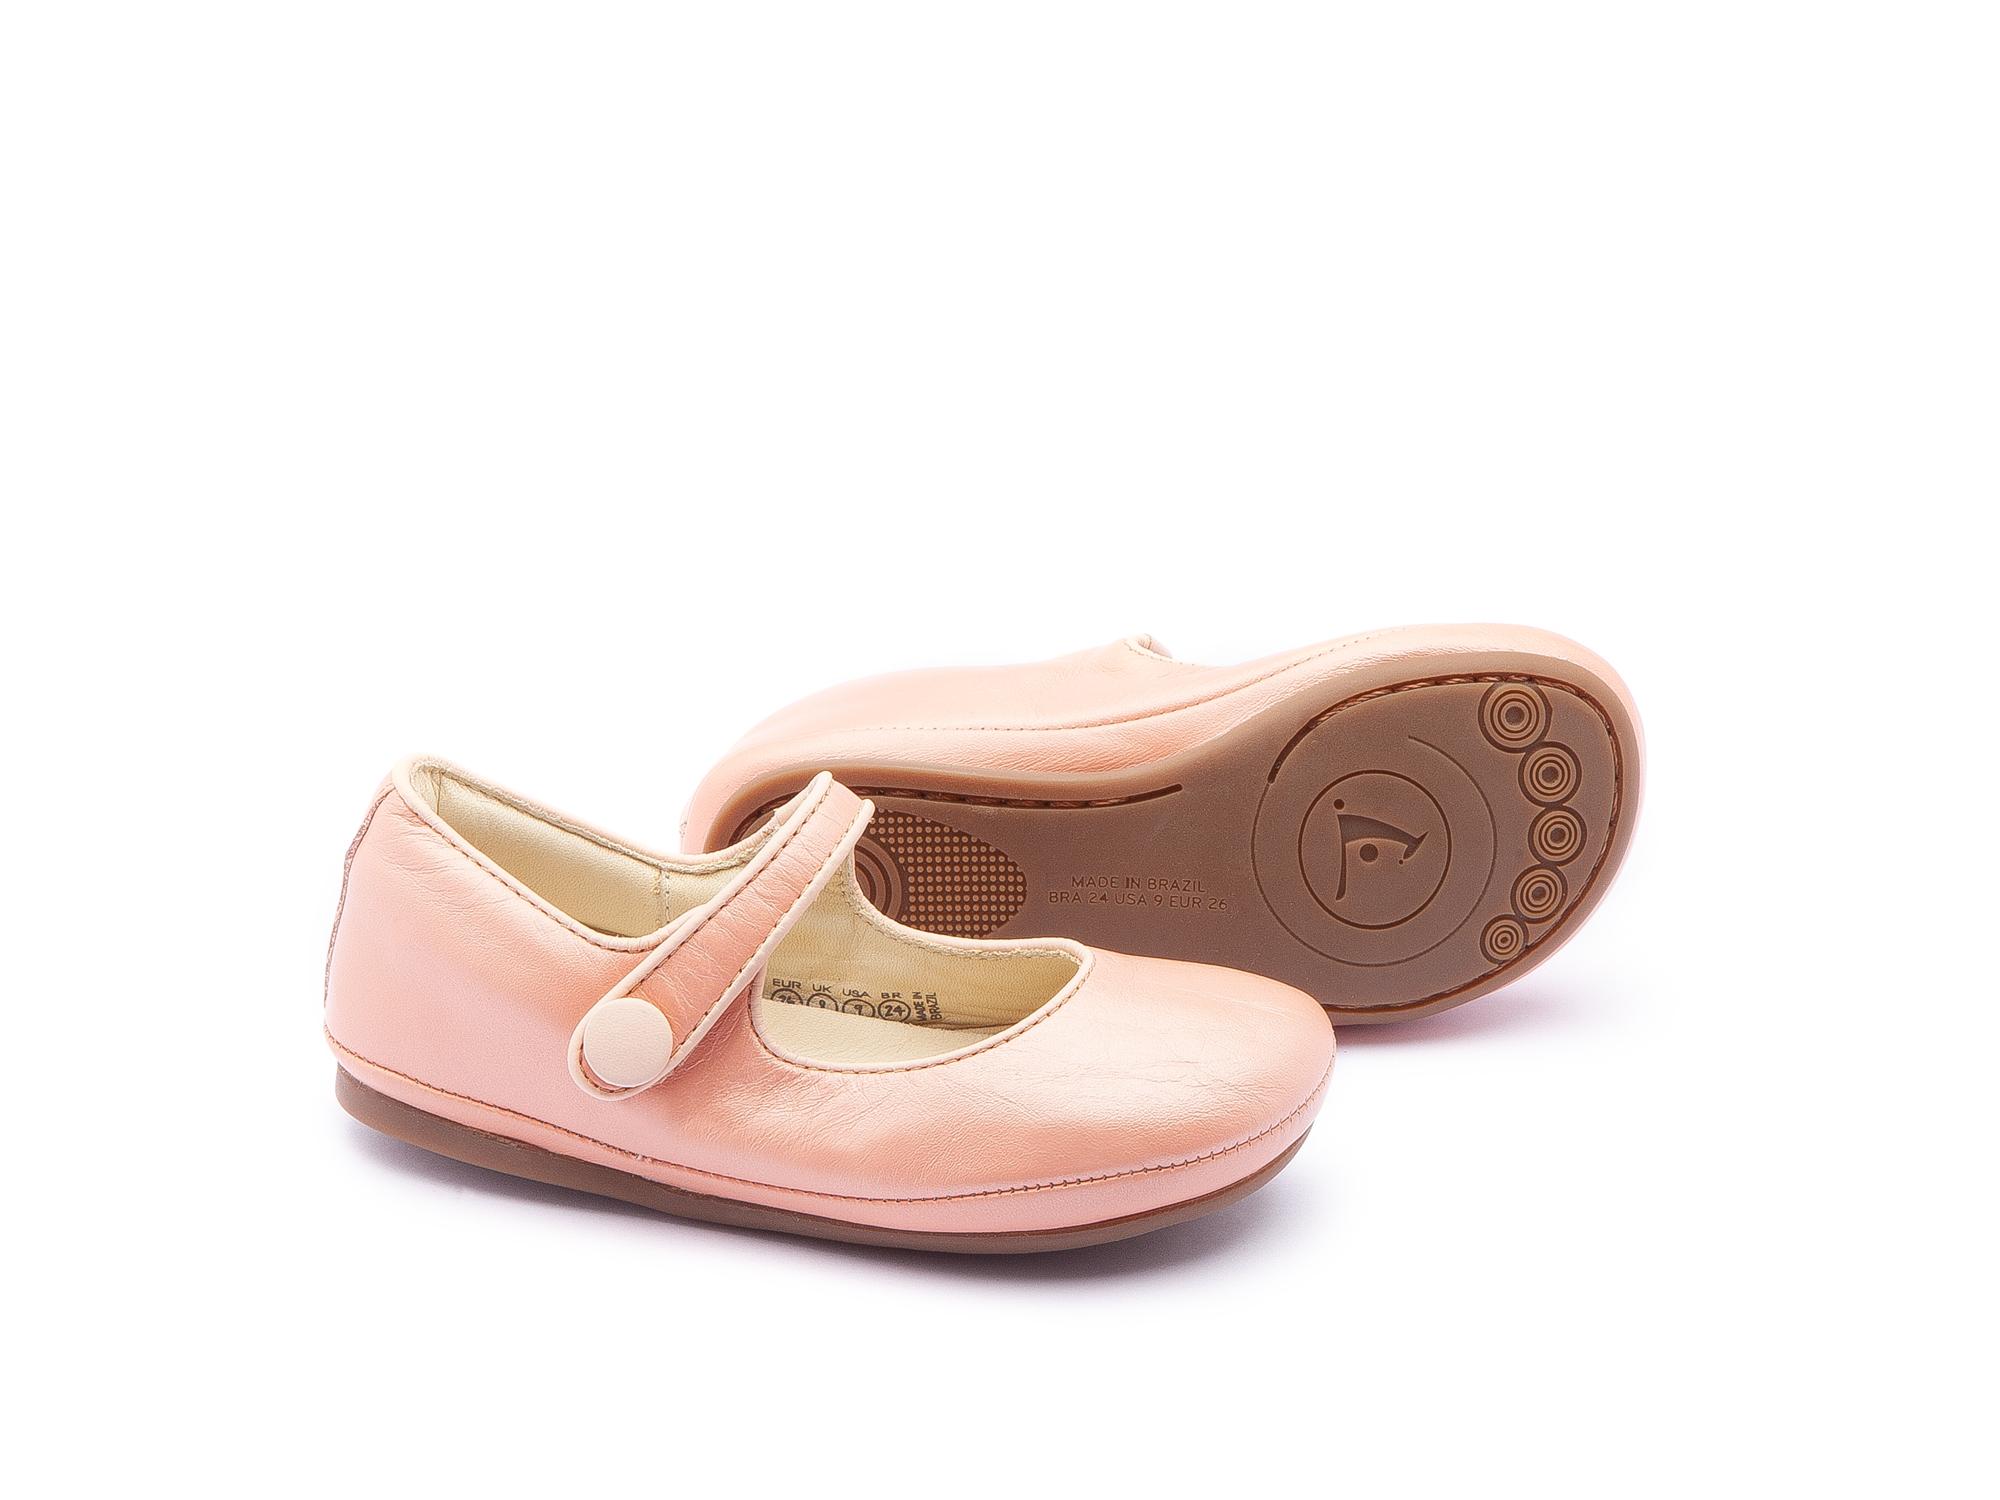 Boneca Little Gavotte Flamingo/ Papaya Cream Toddler 2 à 4 anos - 1